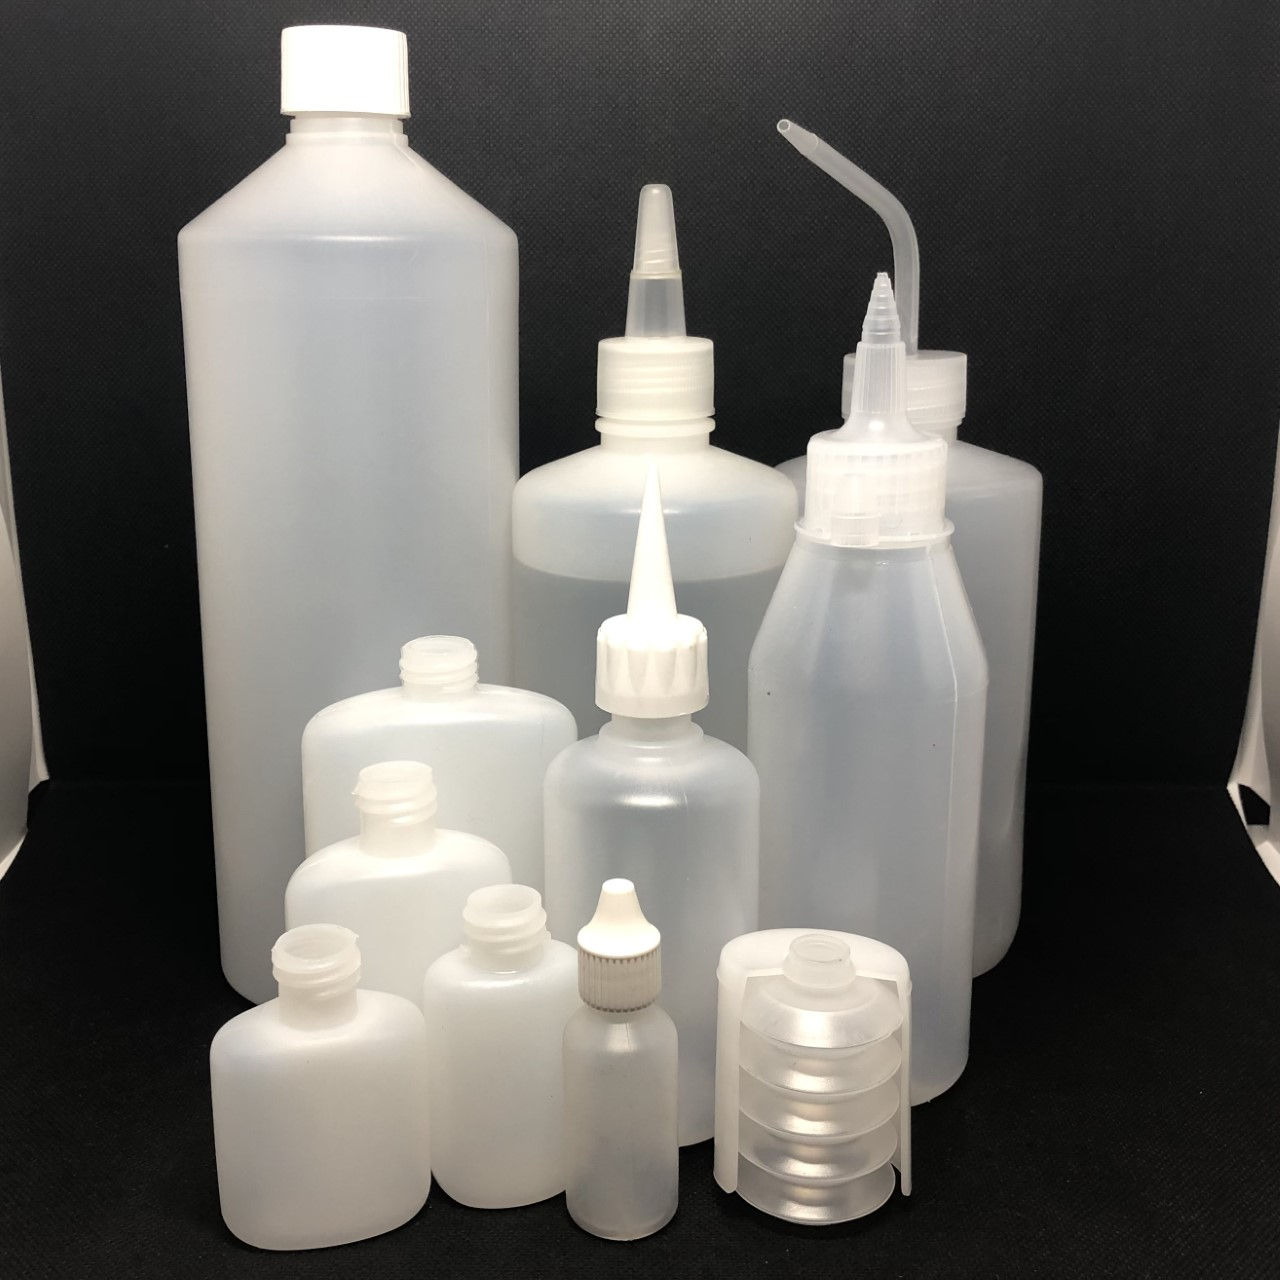 Accessories - Nozzles / Tips / Bottles / Guns